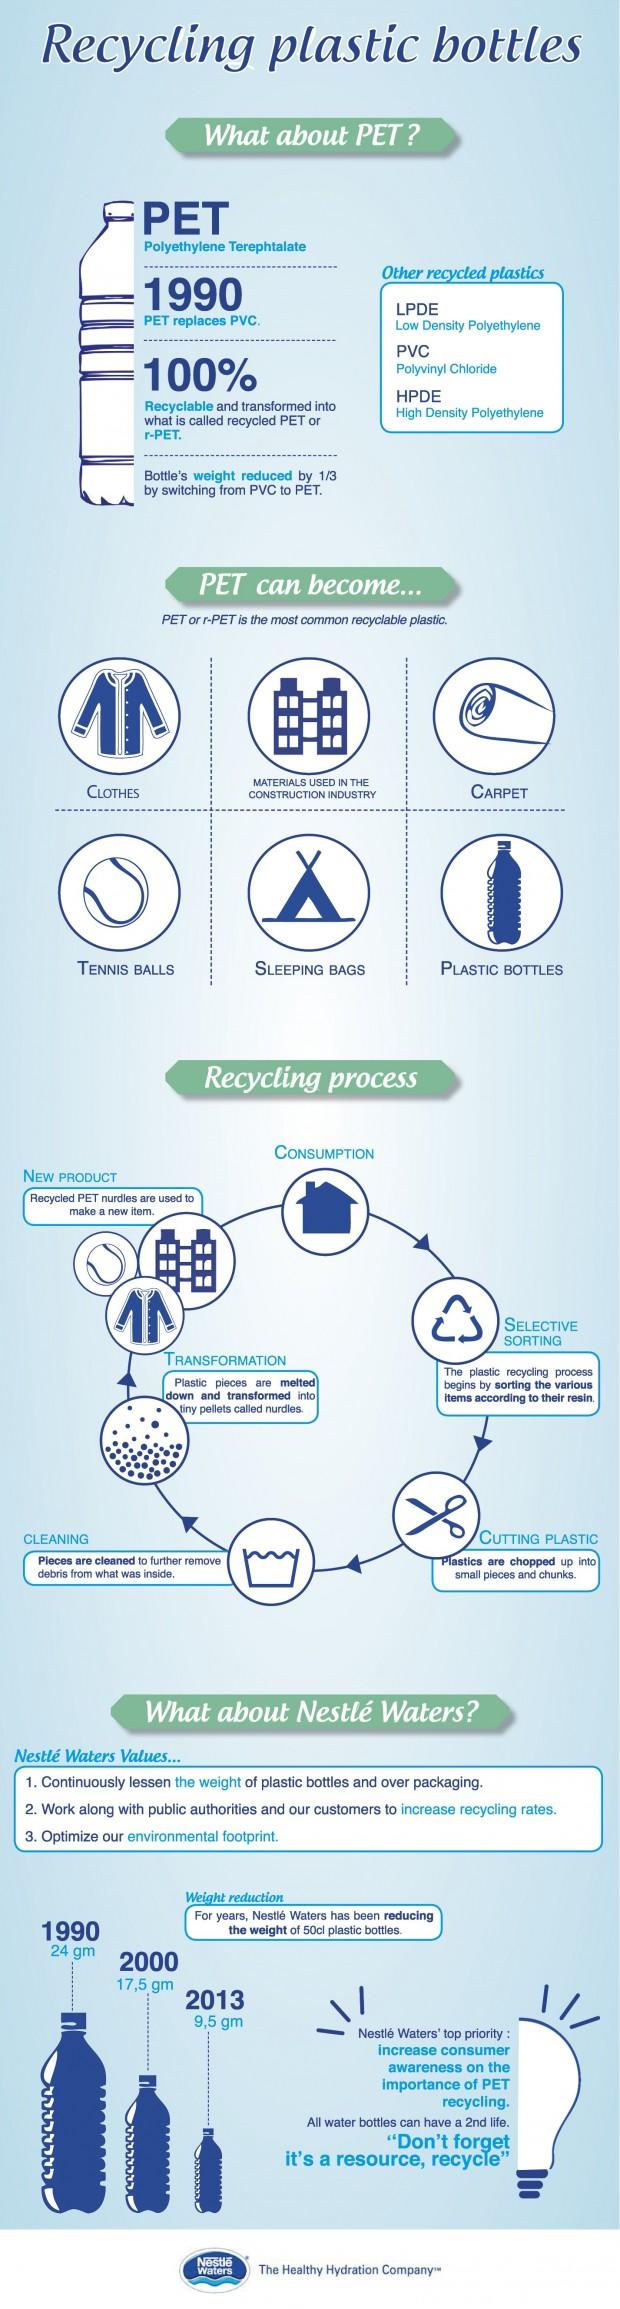 nestle-recycling-plastic-bottles